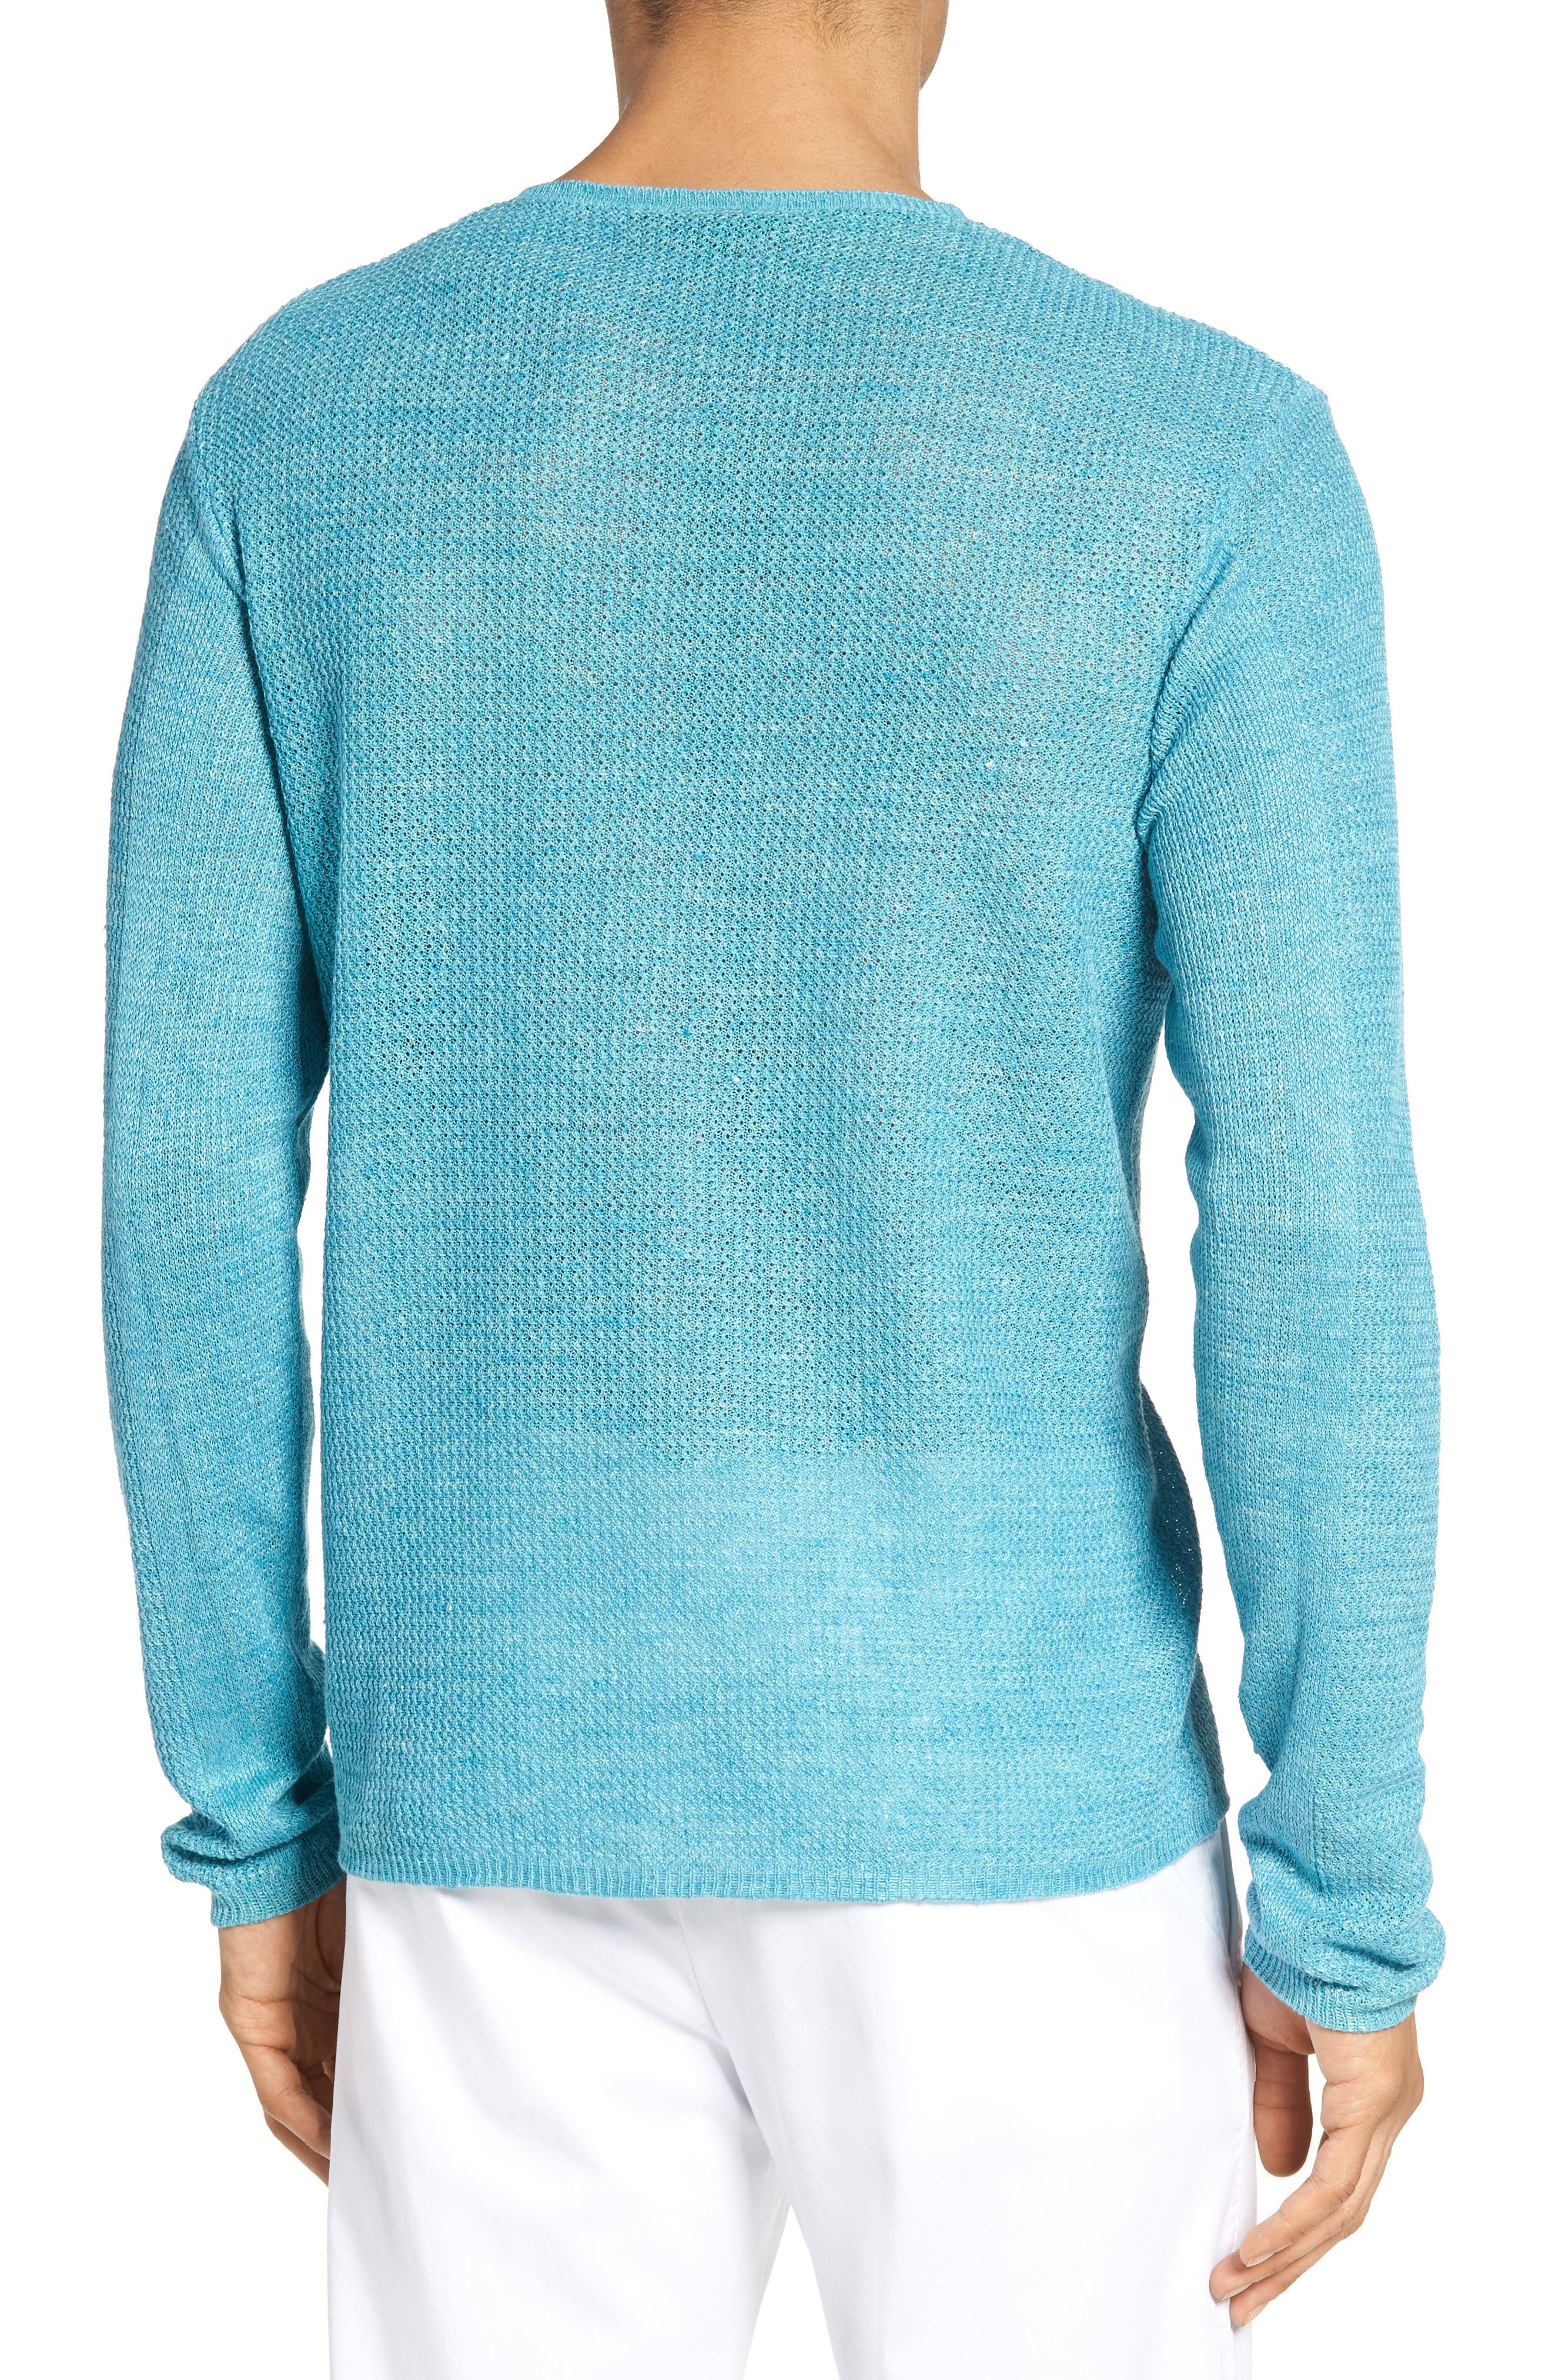 Chapman Linen Sweater,                             Alternate thumbnail 2, color,                             Aqua